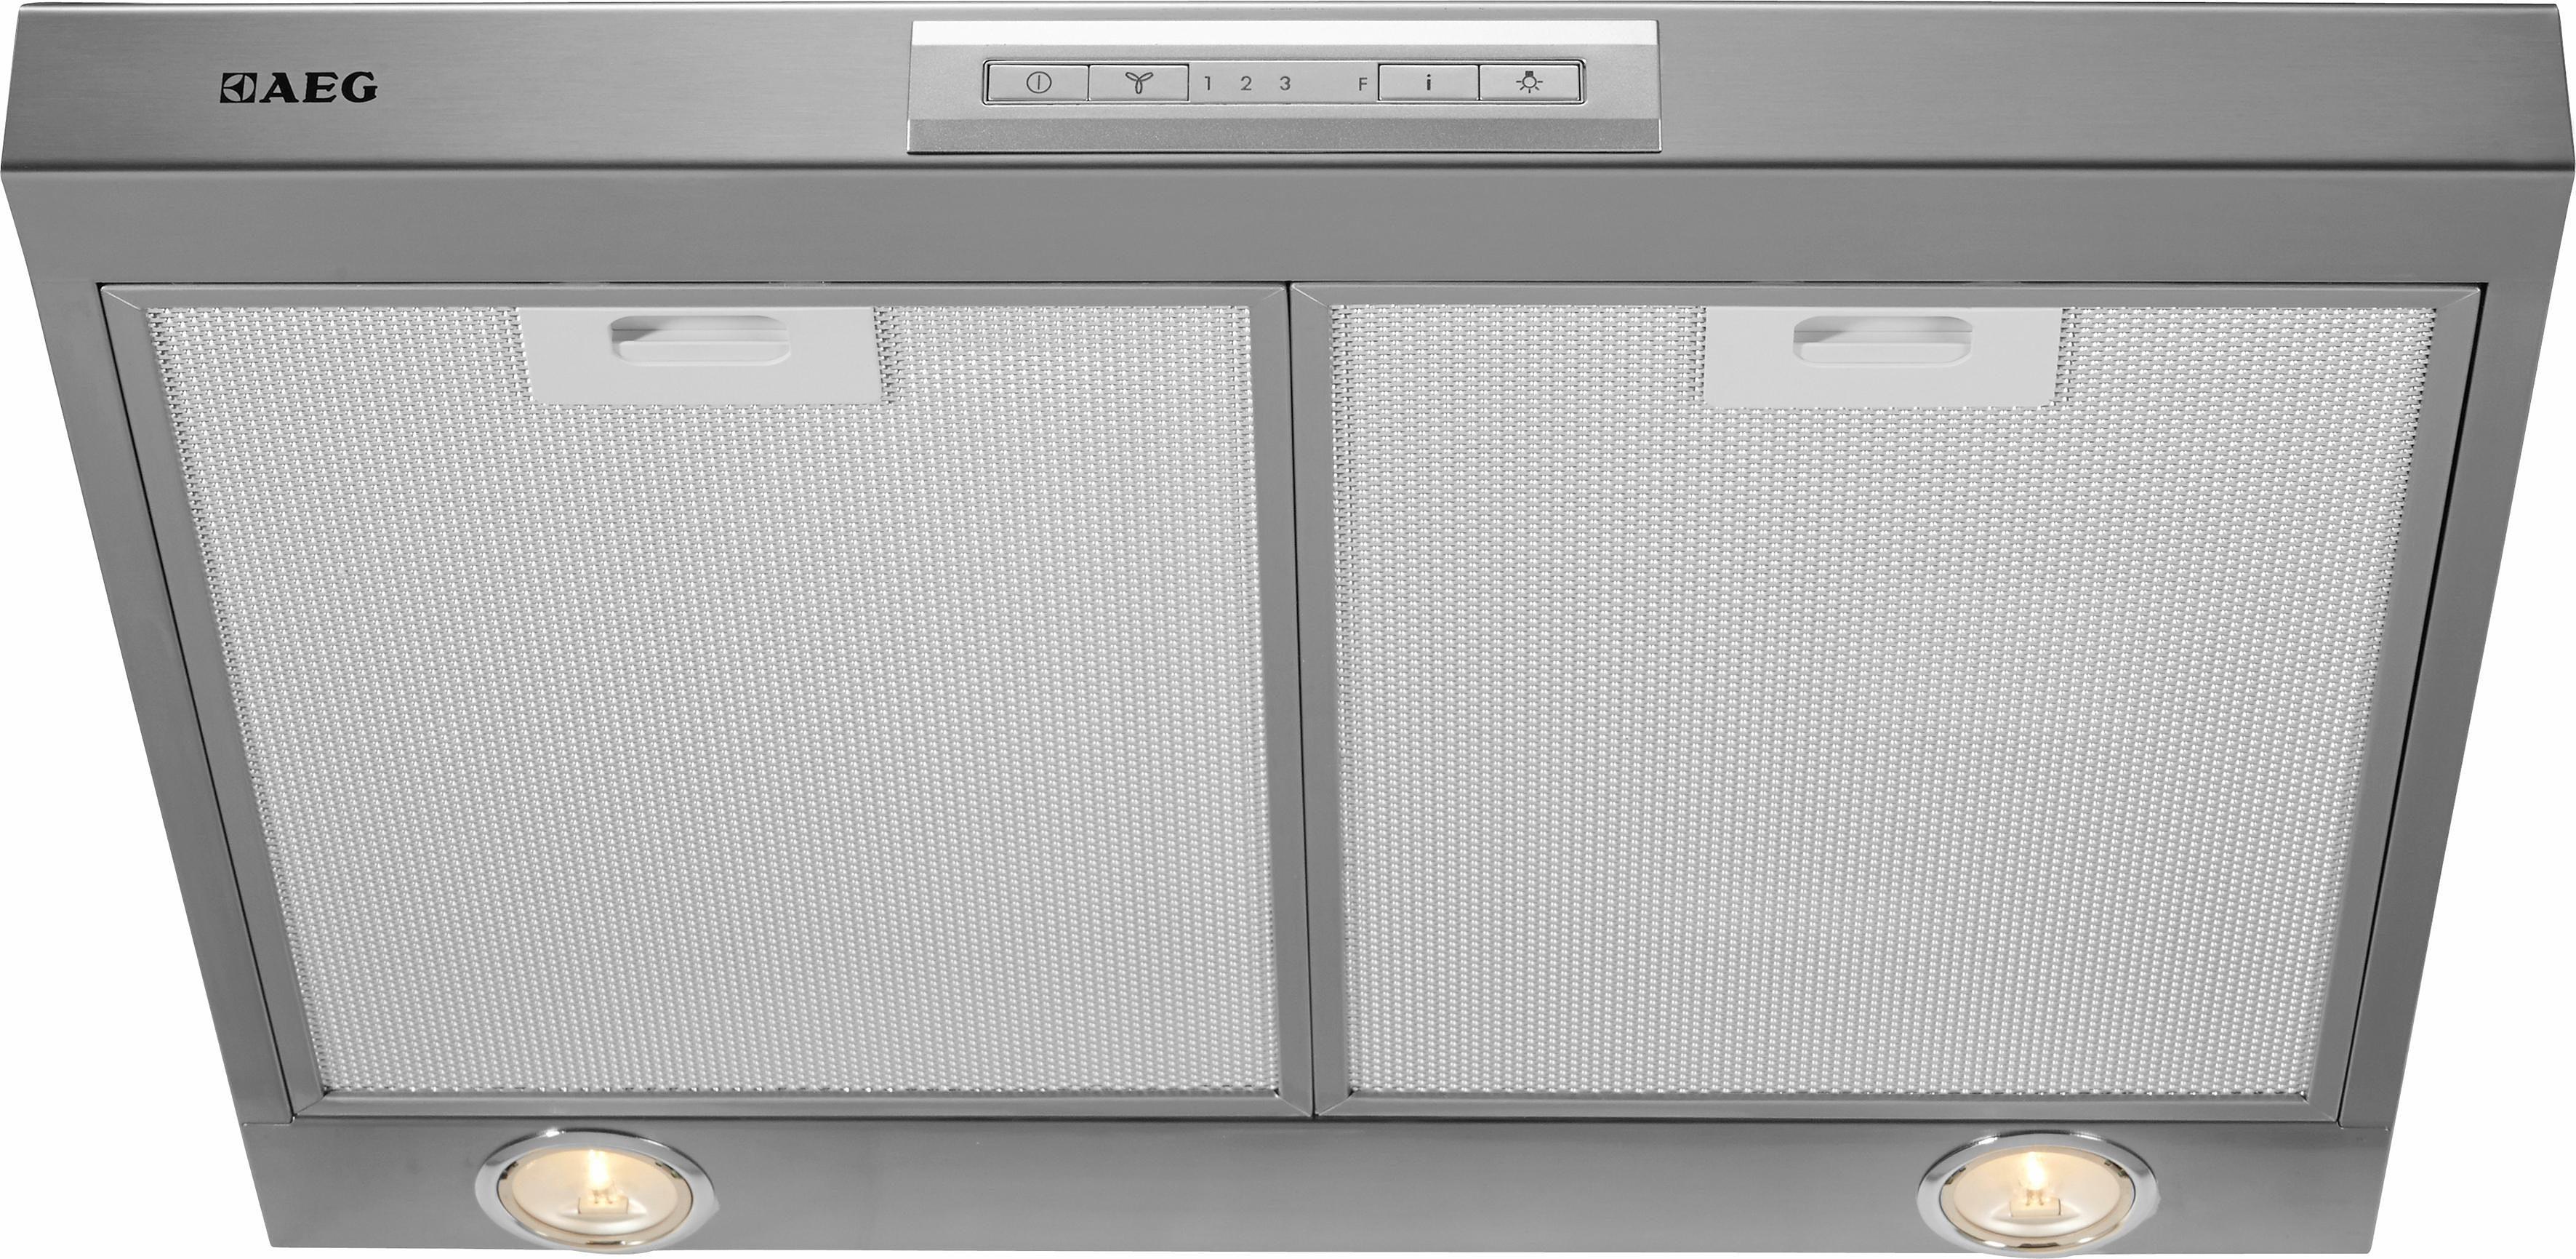 AEG Unterbauhaube COMPETENCE / X56223MT10, D